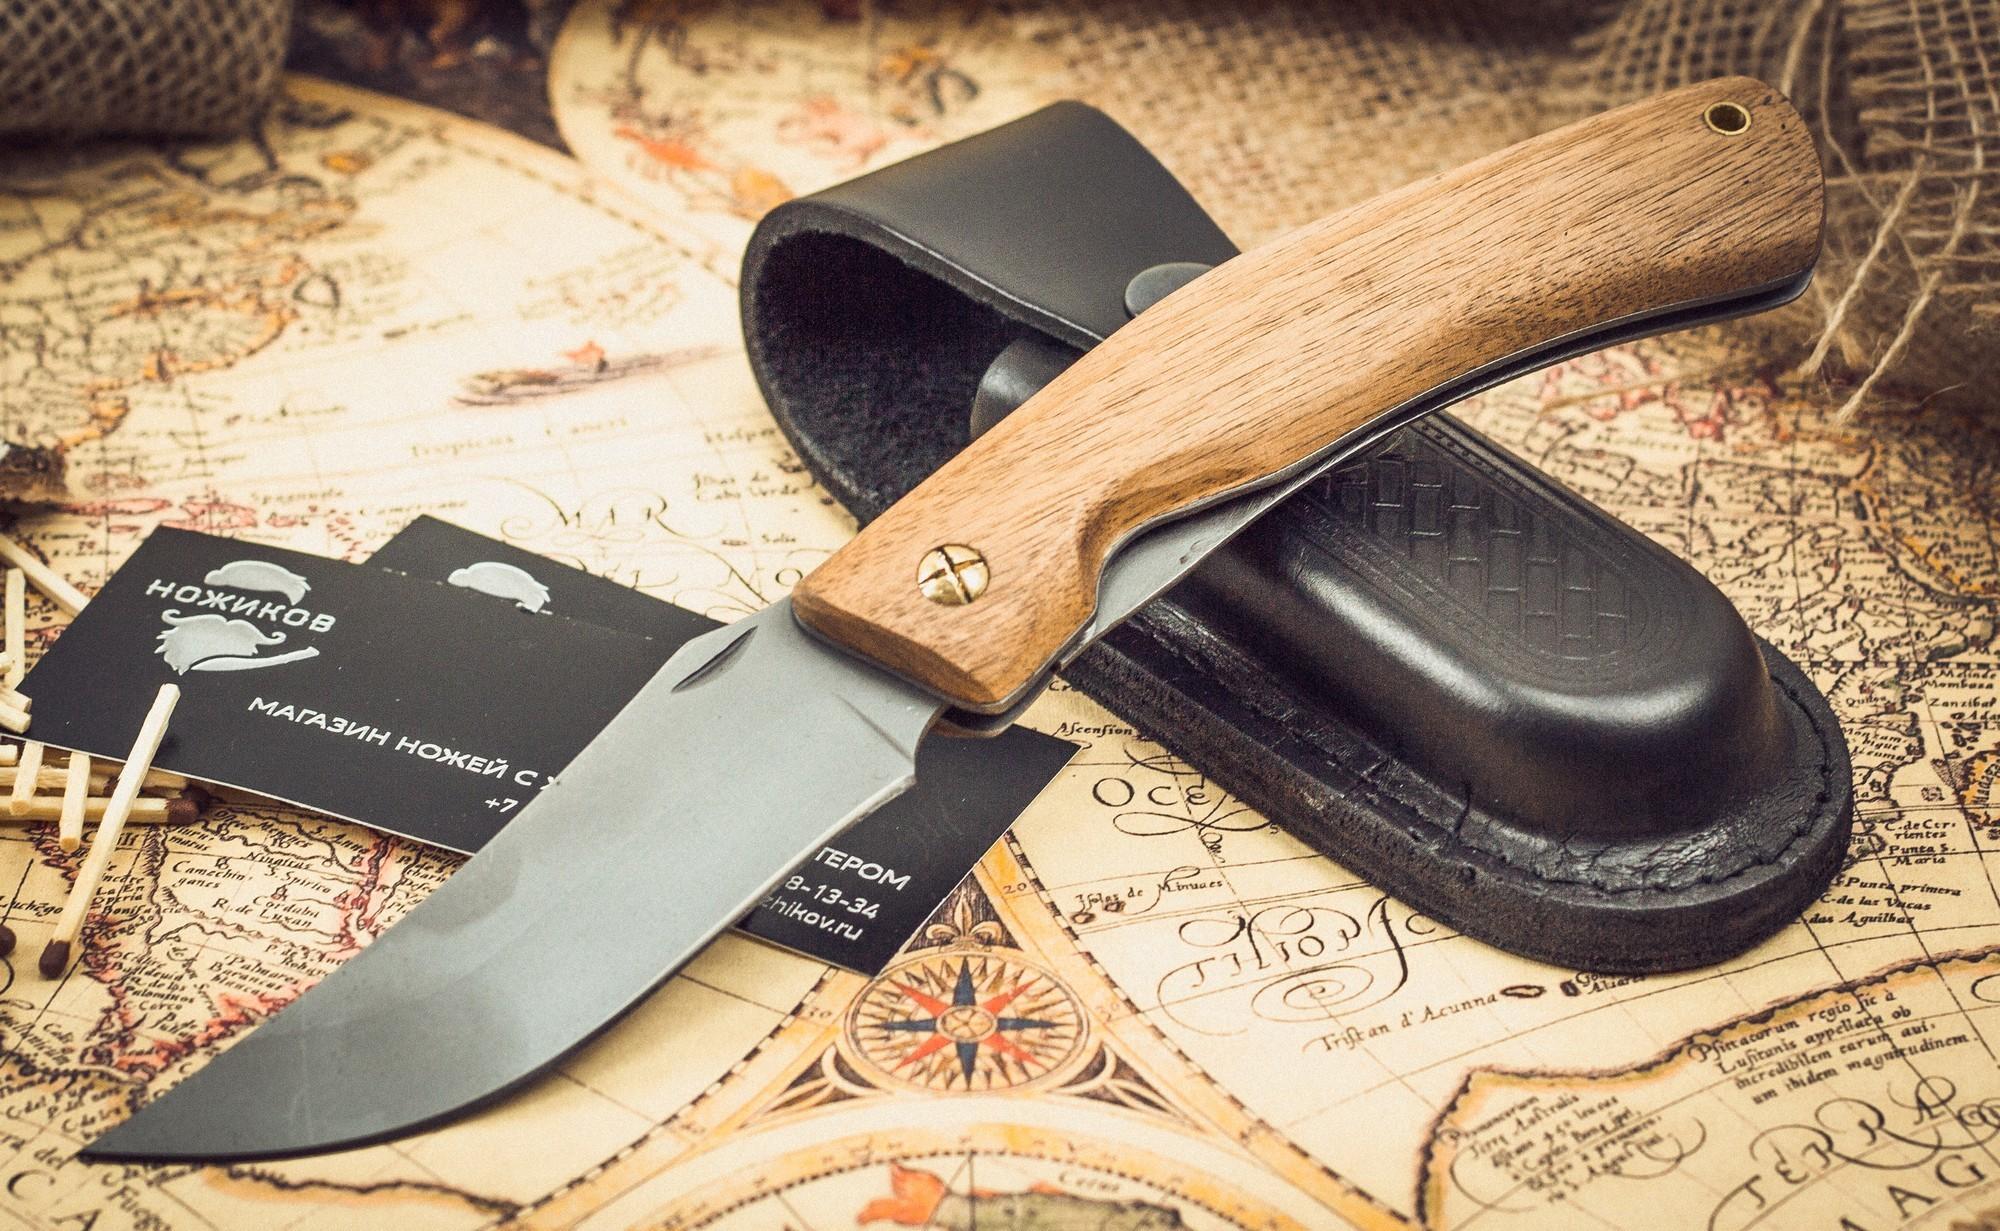 Фото 6 - Складные ножи Косач , сталь 95Х18 от Марычев